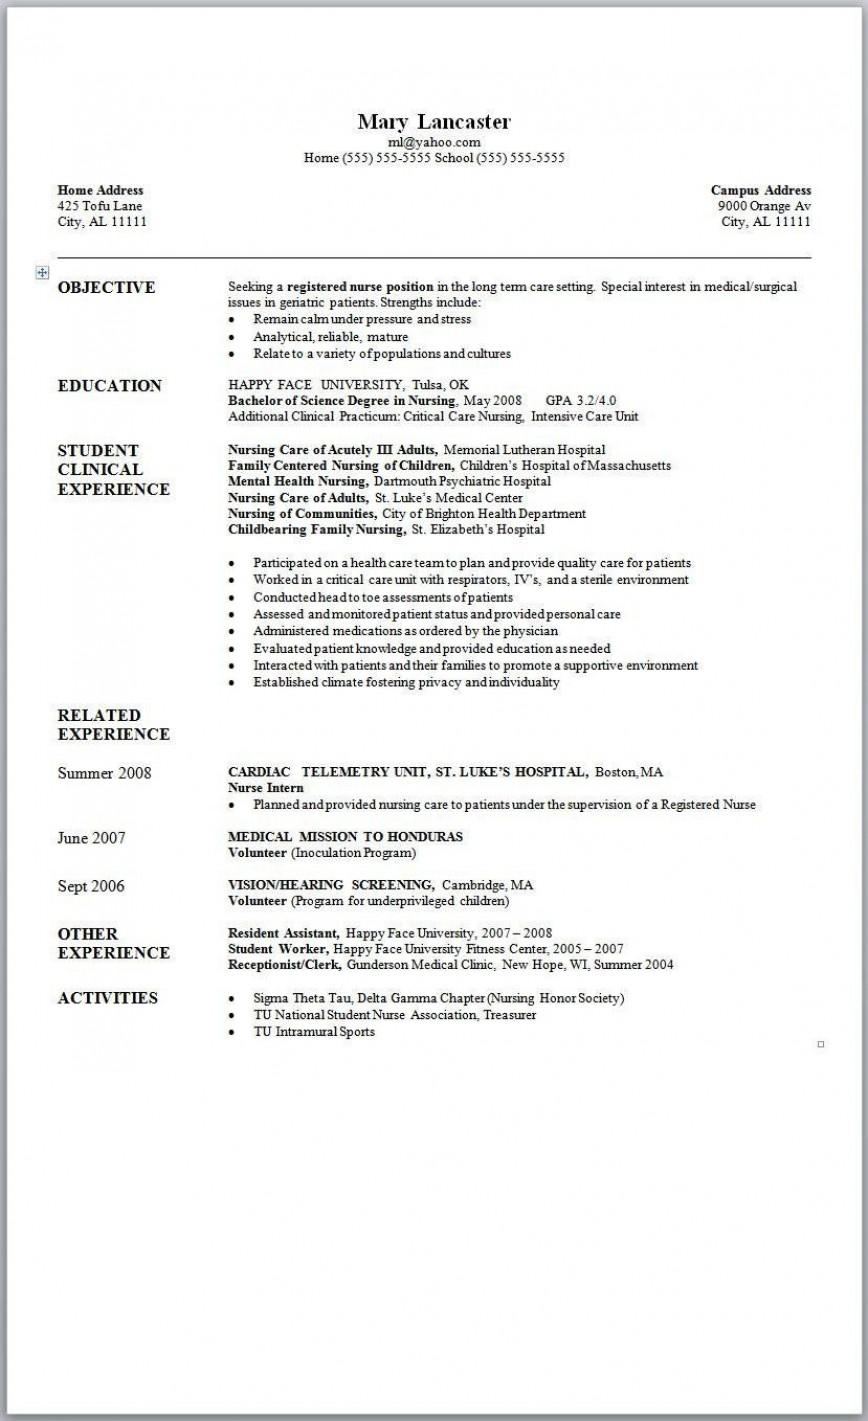 008 Impressive M Word 2010 Resume Template Concept  Templates Free Microsoft Office